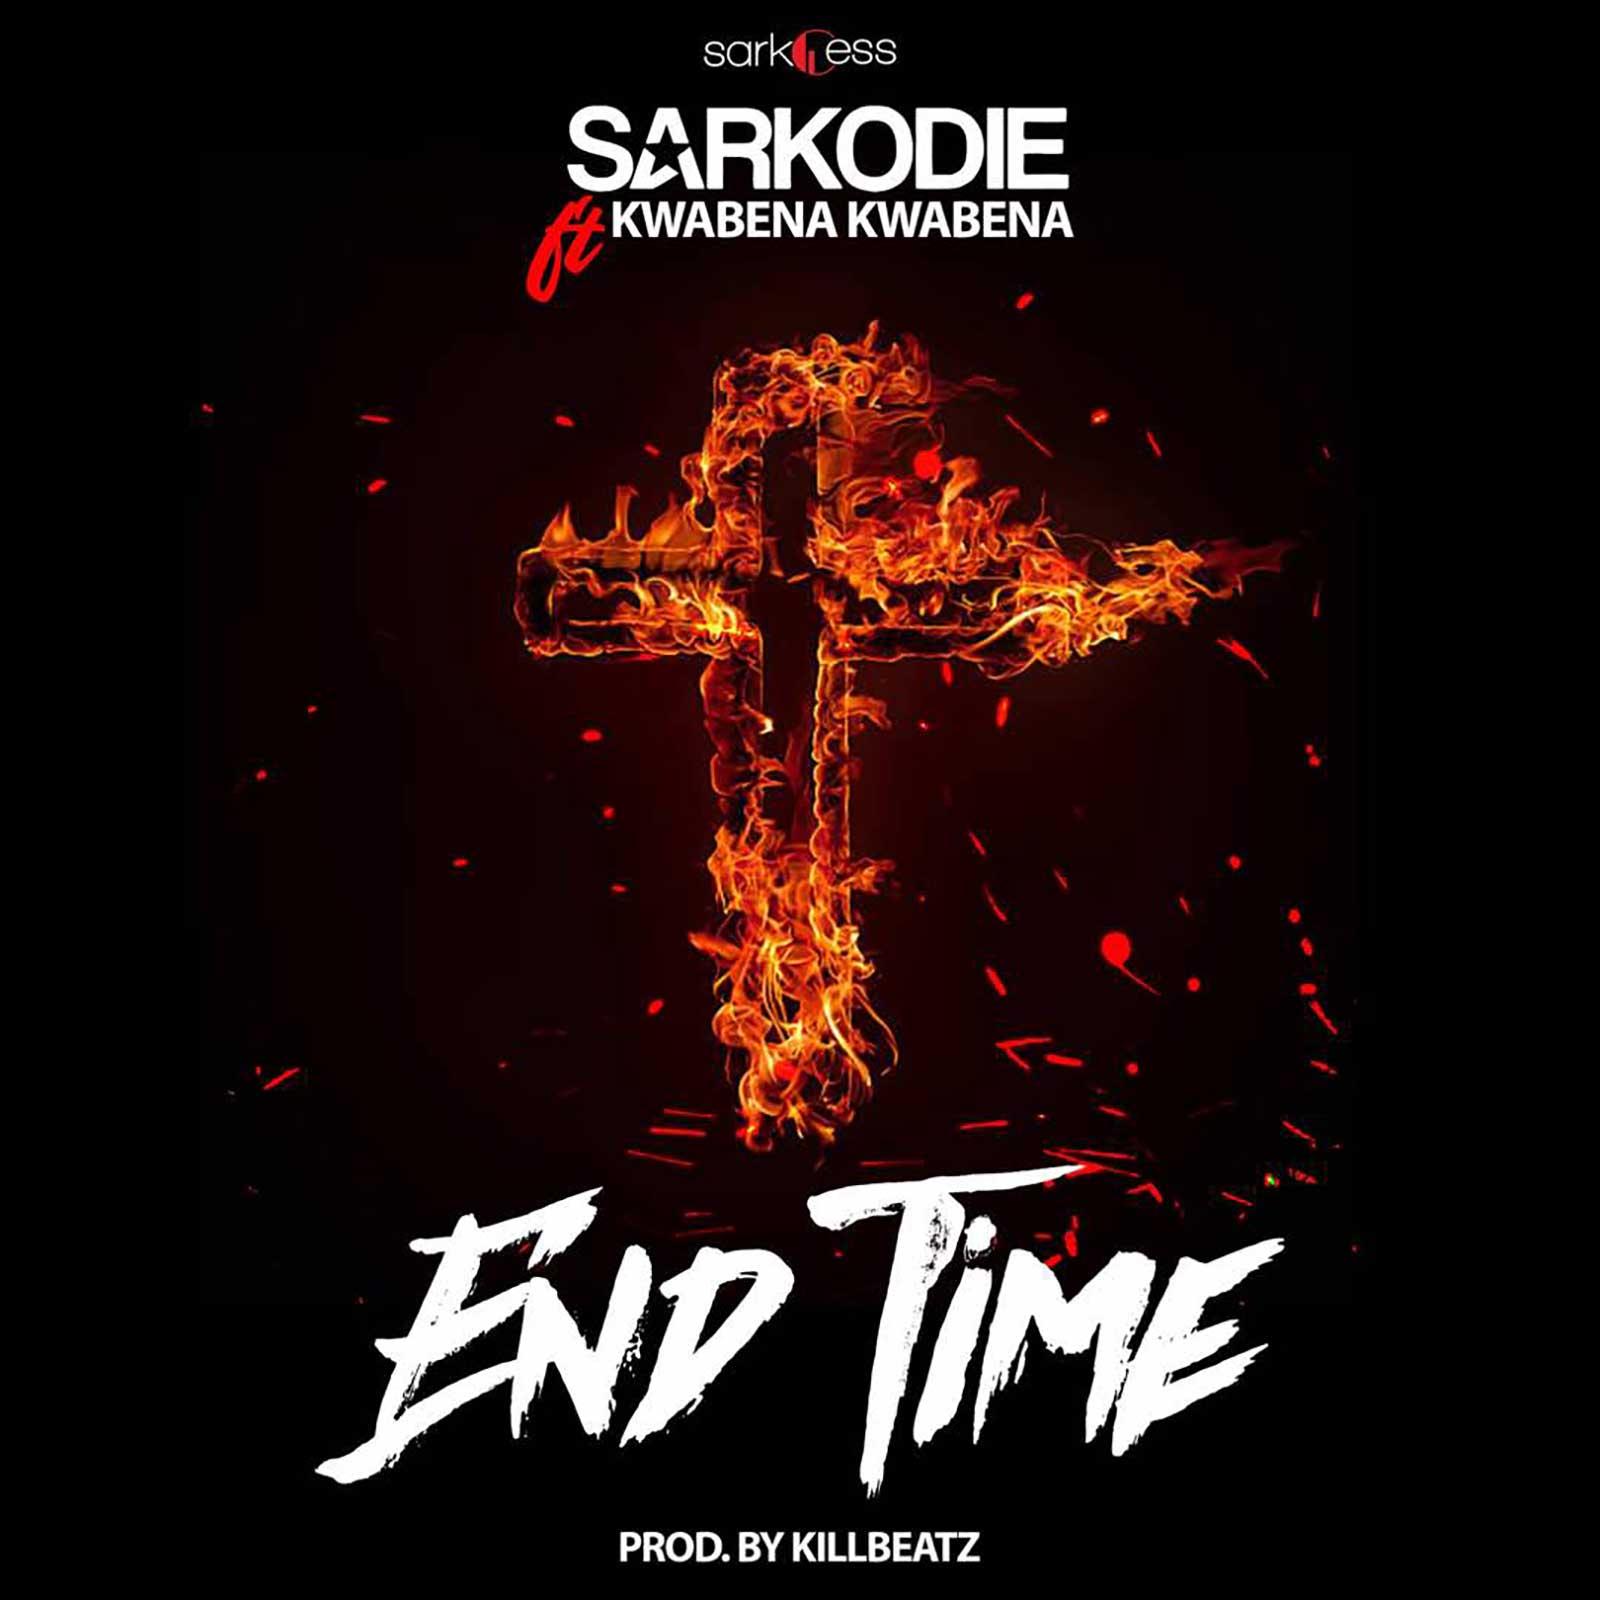 End Time by Sarkodie feat. Kwabena Kwabena